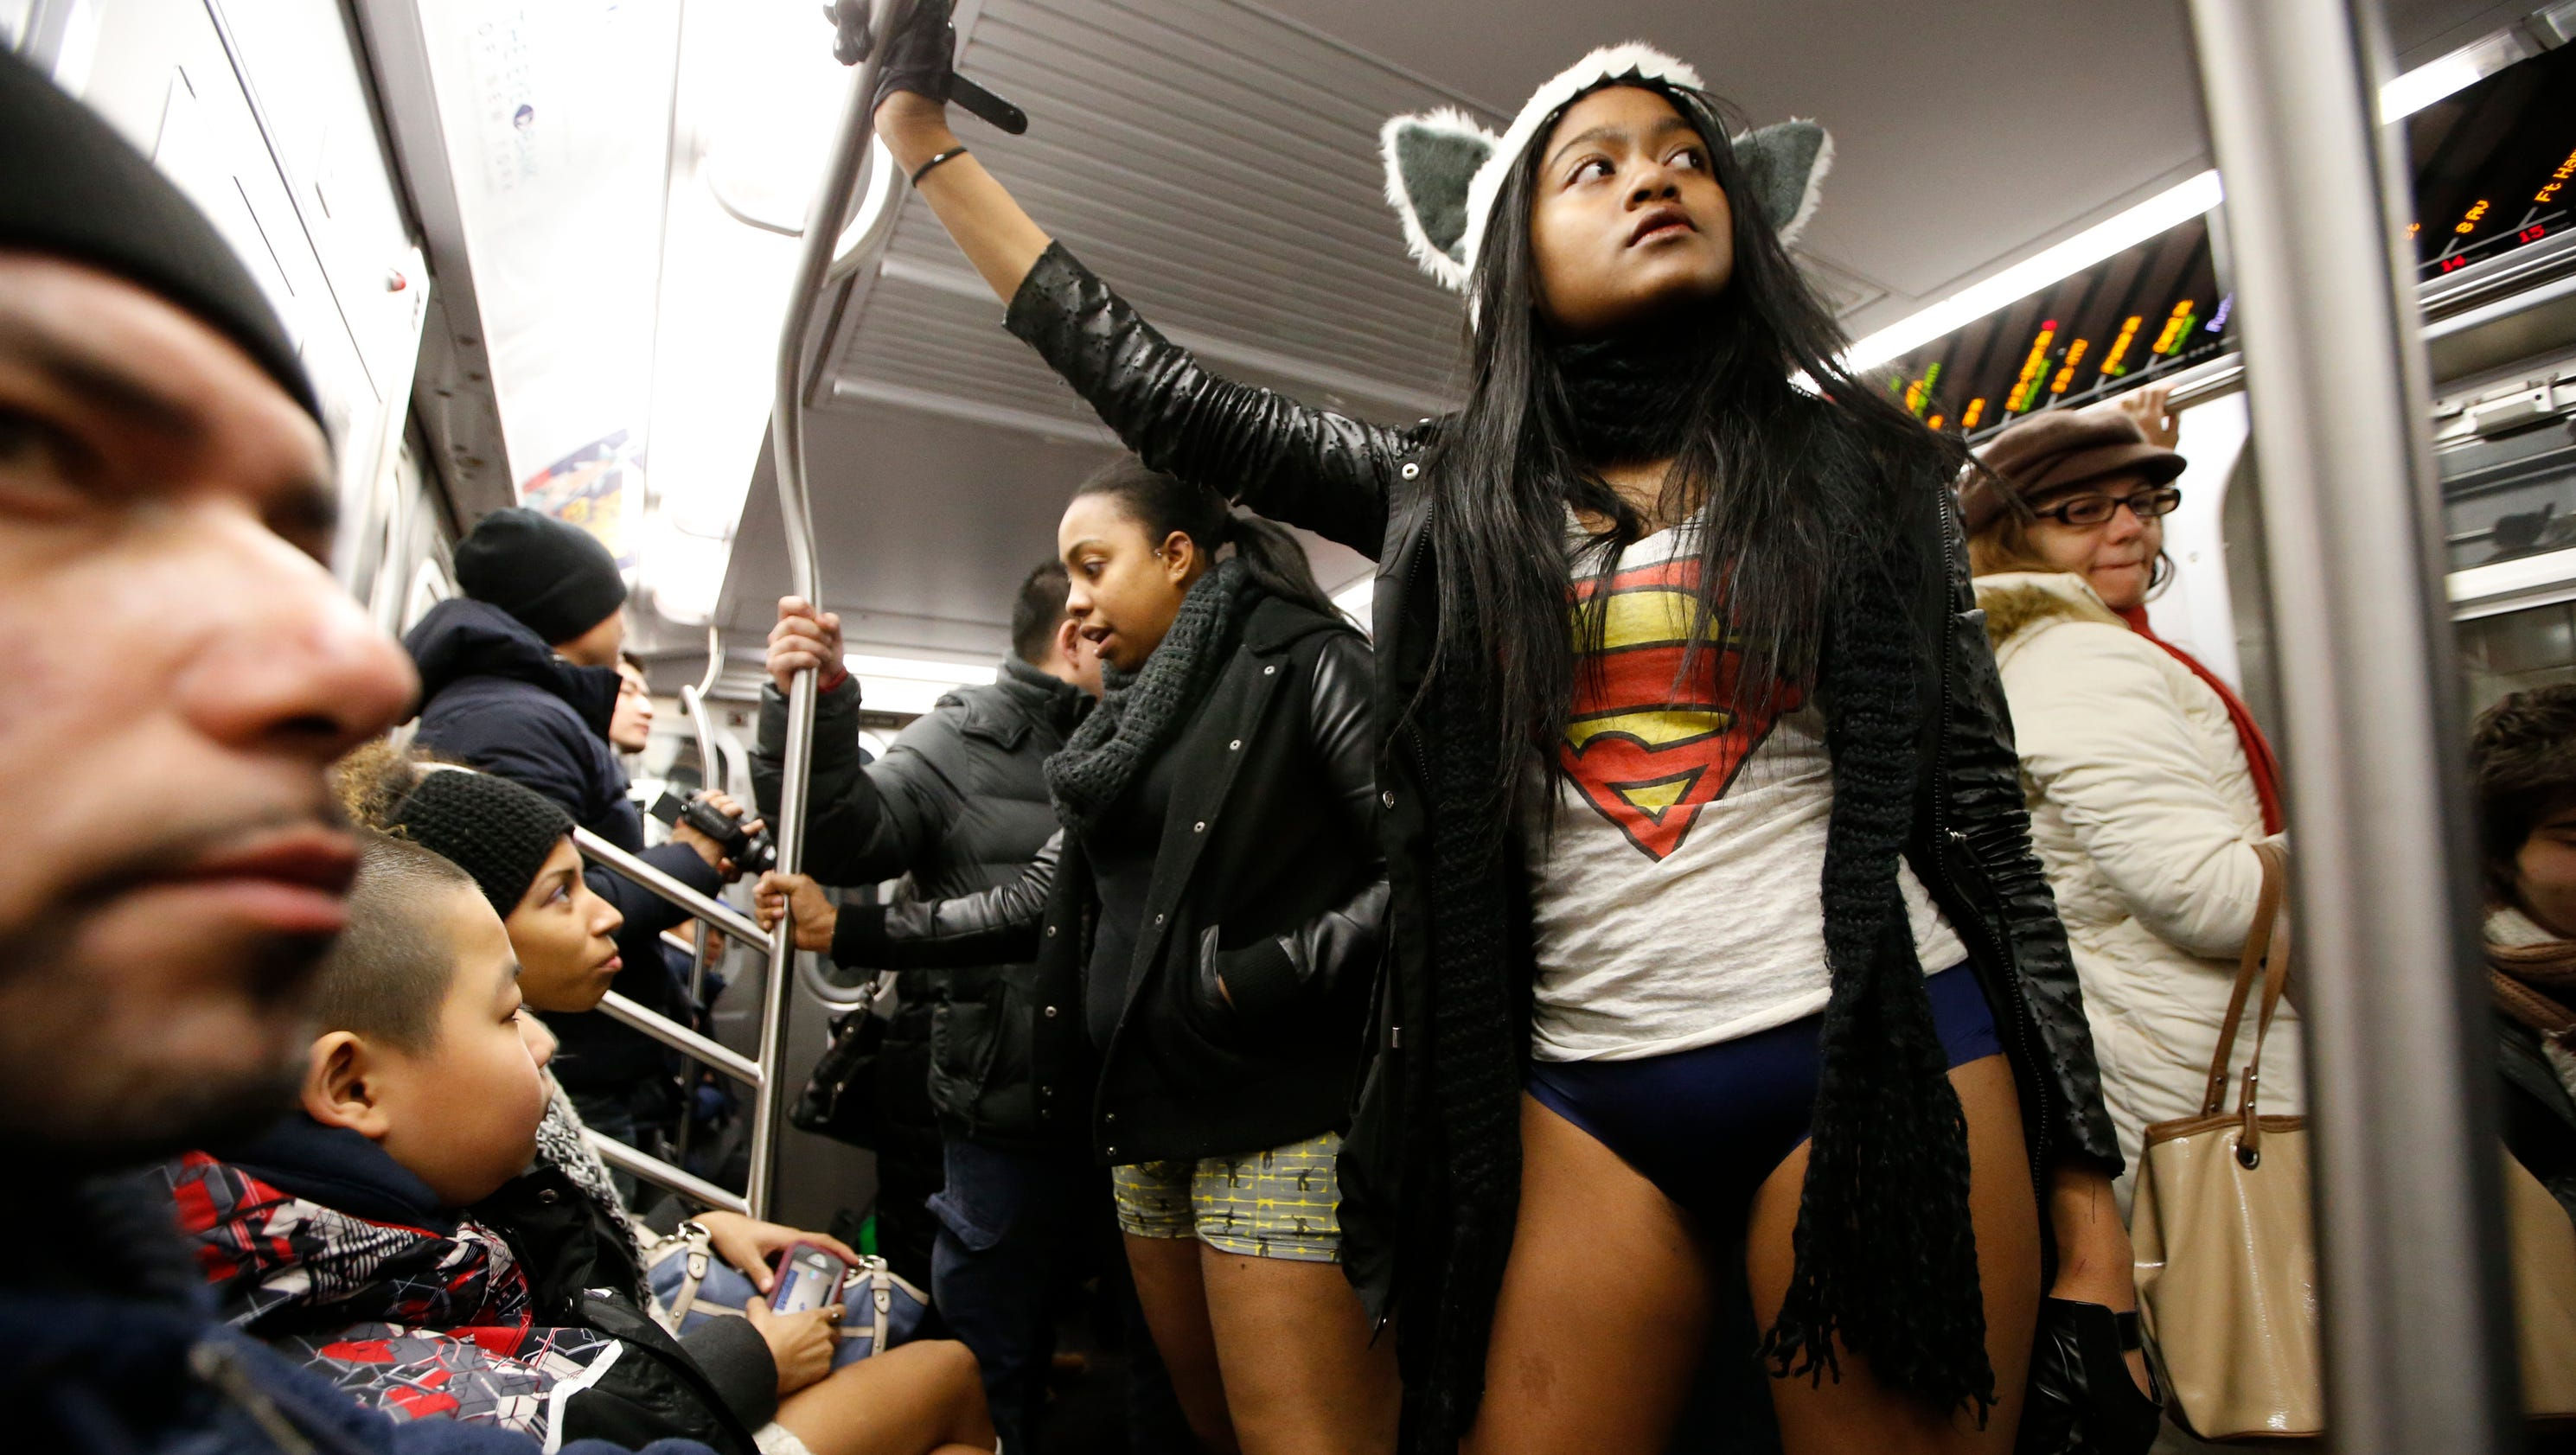 The subways money and celebrity tpba